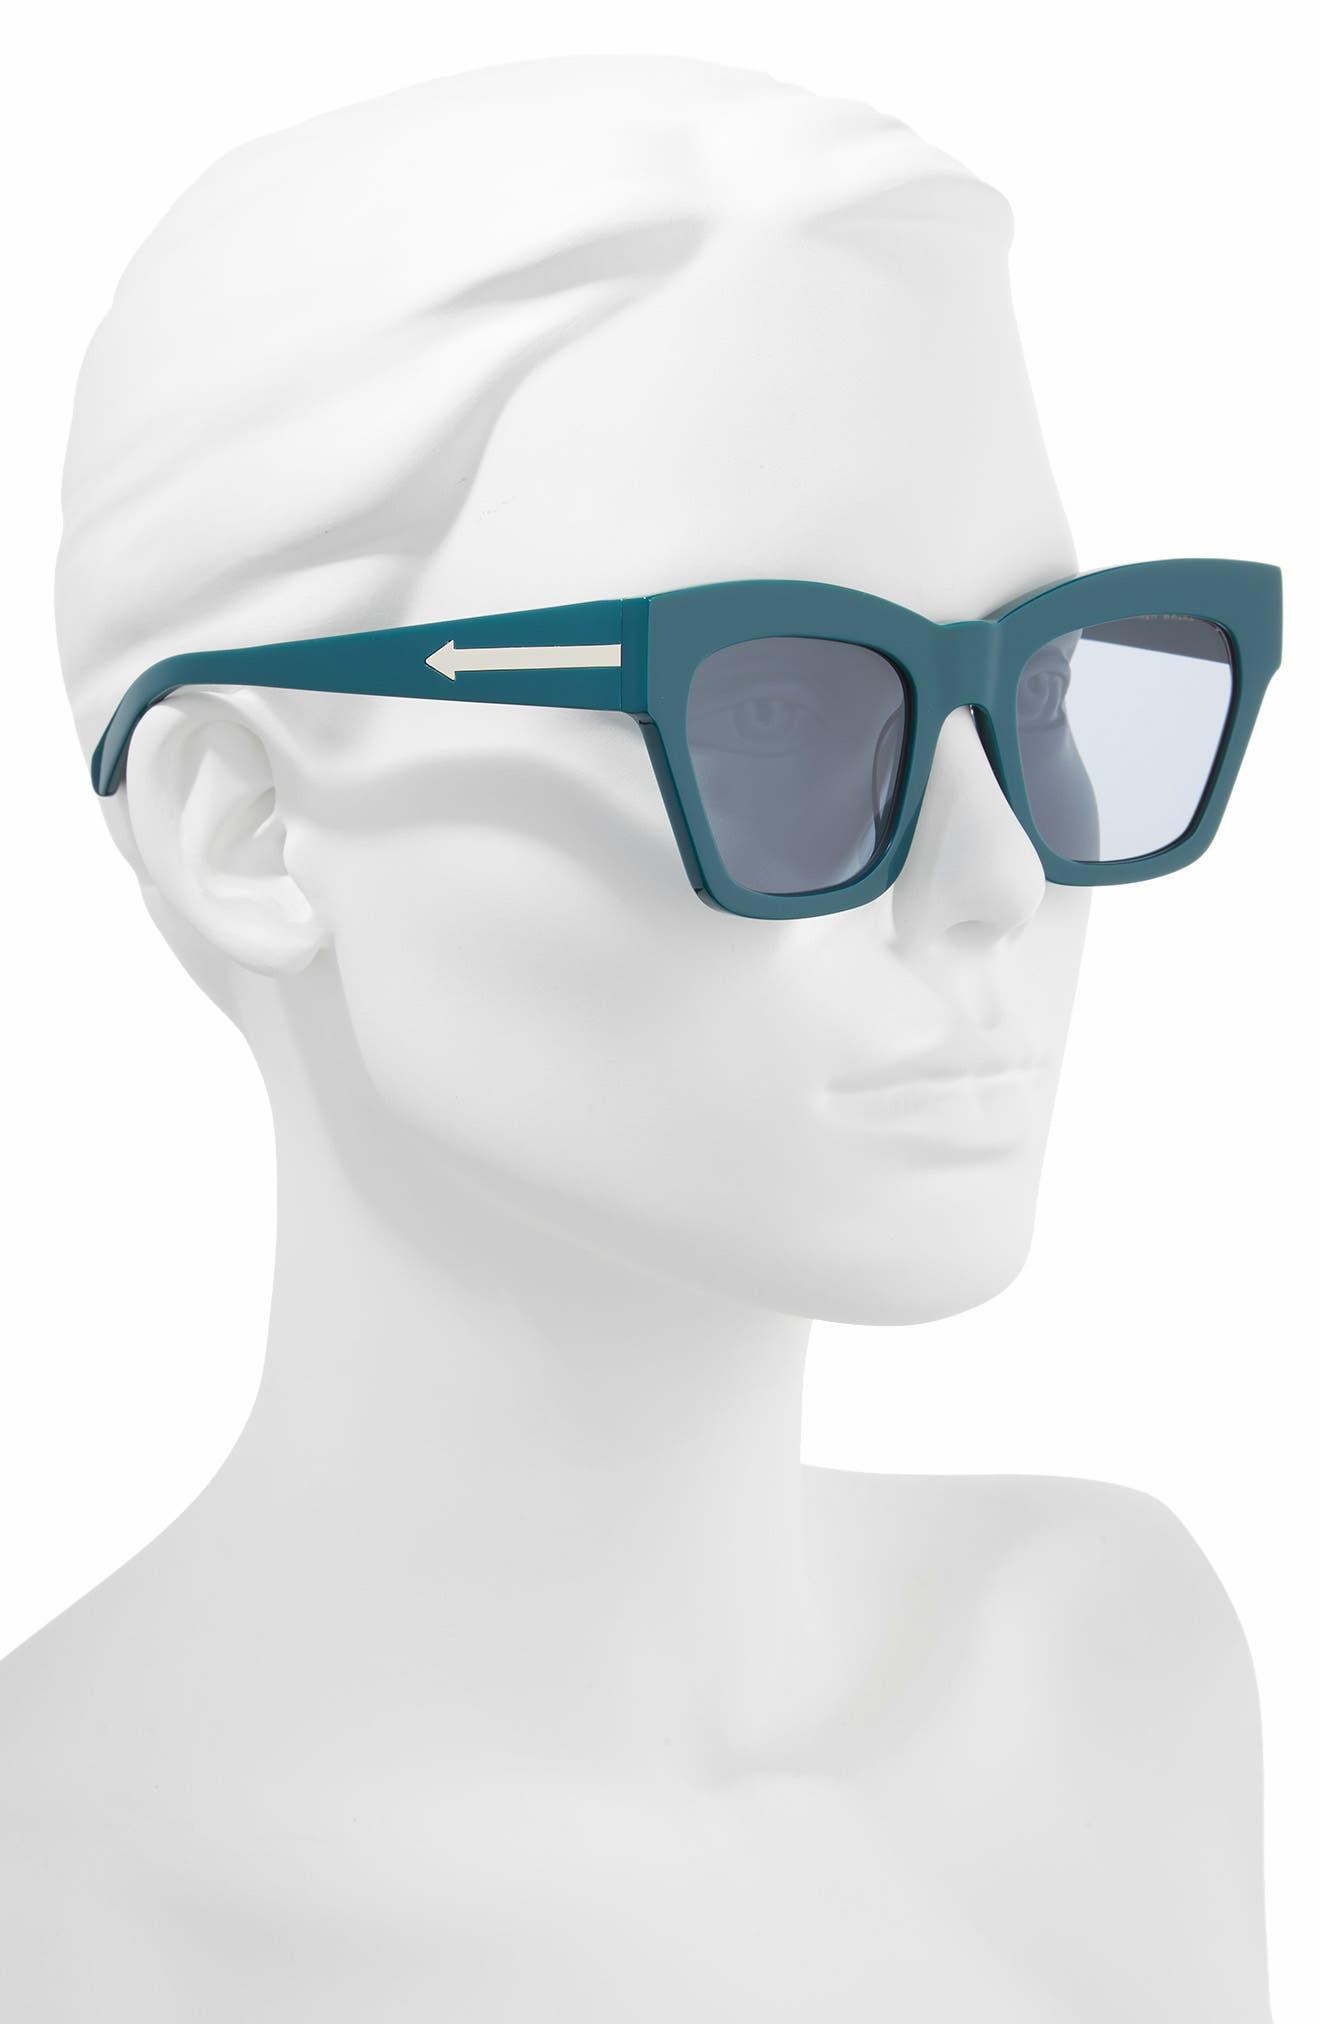 Treasure 52mm Cat Eye Sunglasses,                             Alternate thumbnail 2, color,                             EMERALD/ EMERALD